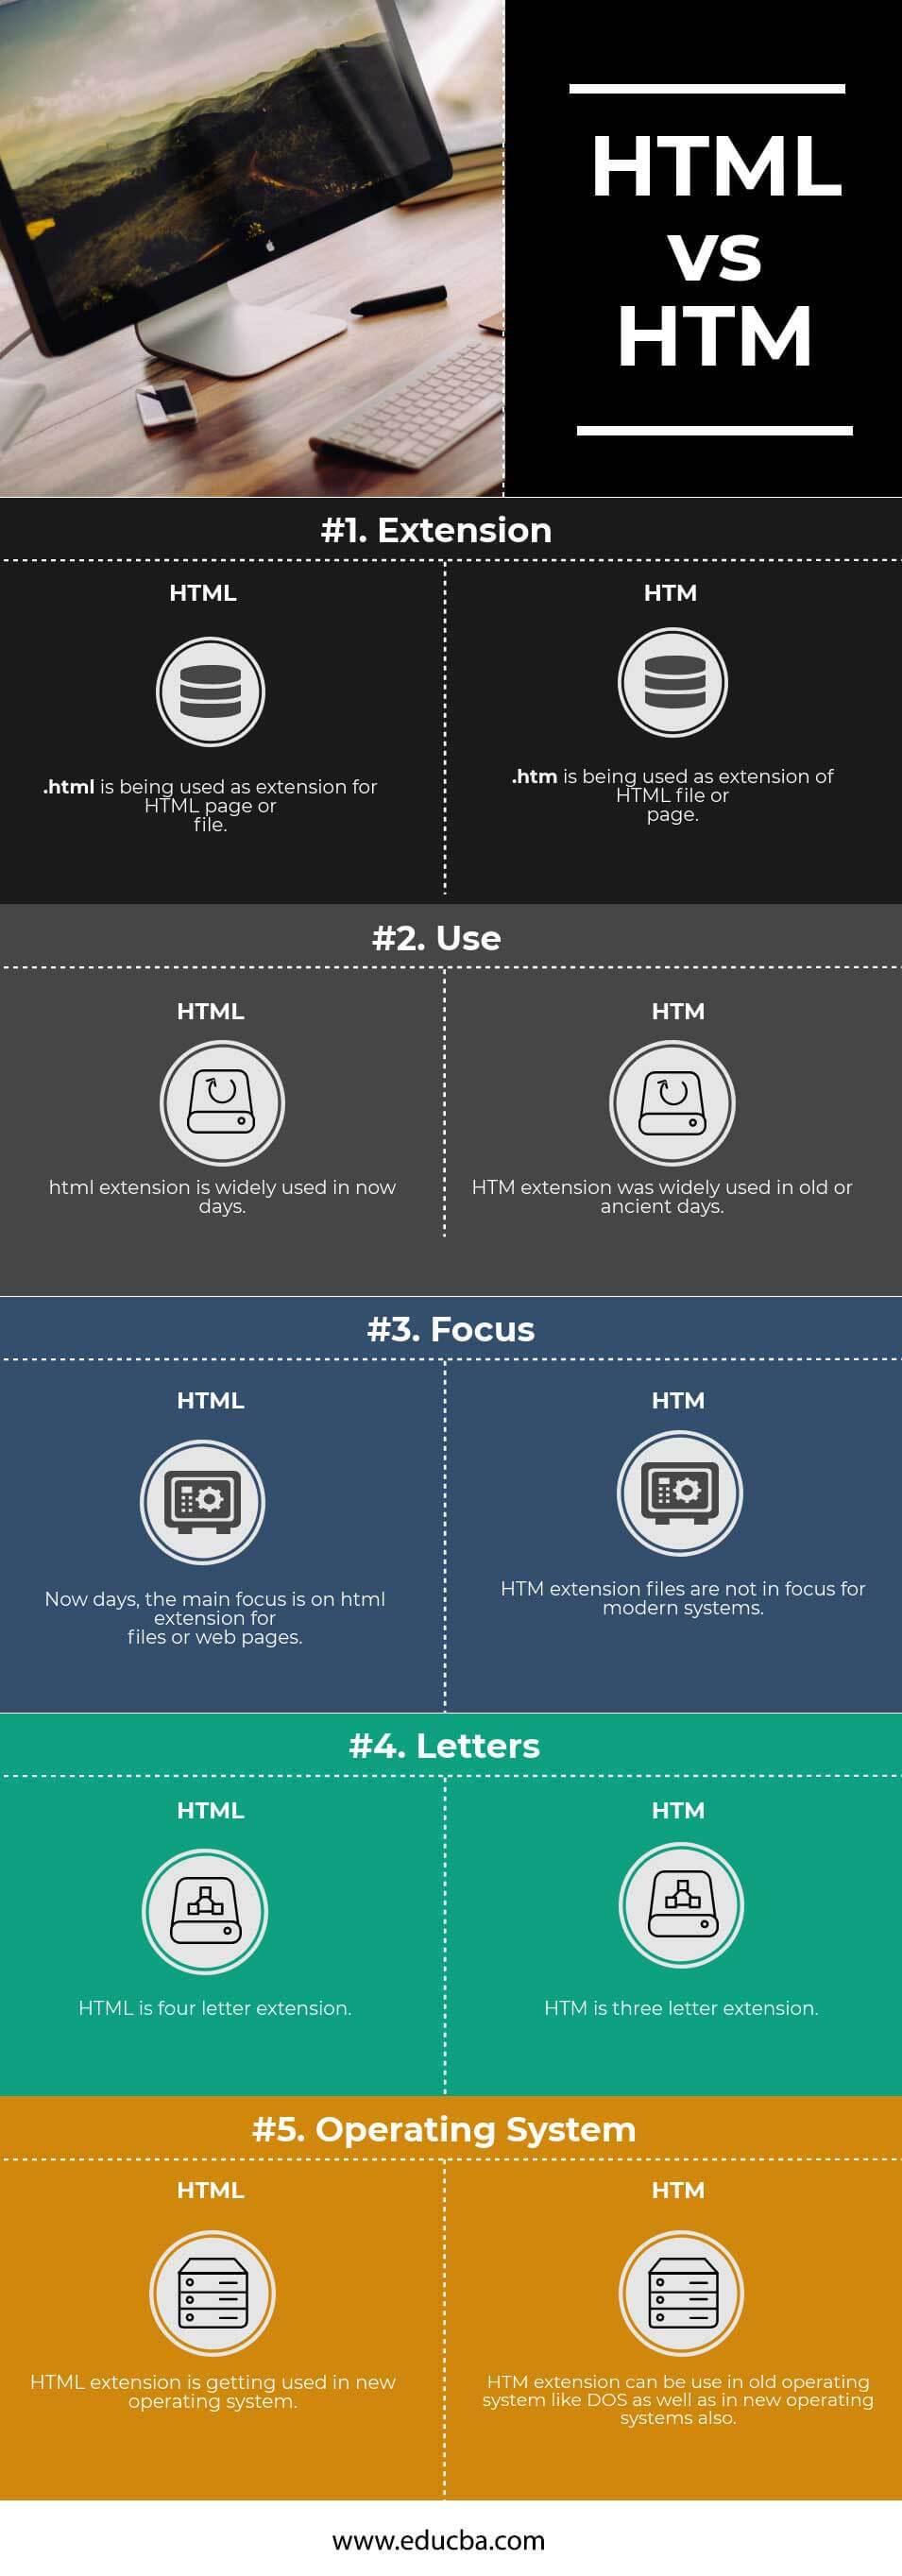 HTML vs HTM